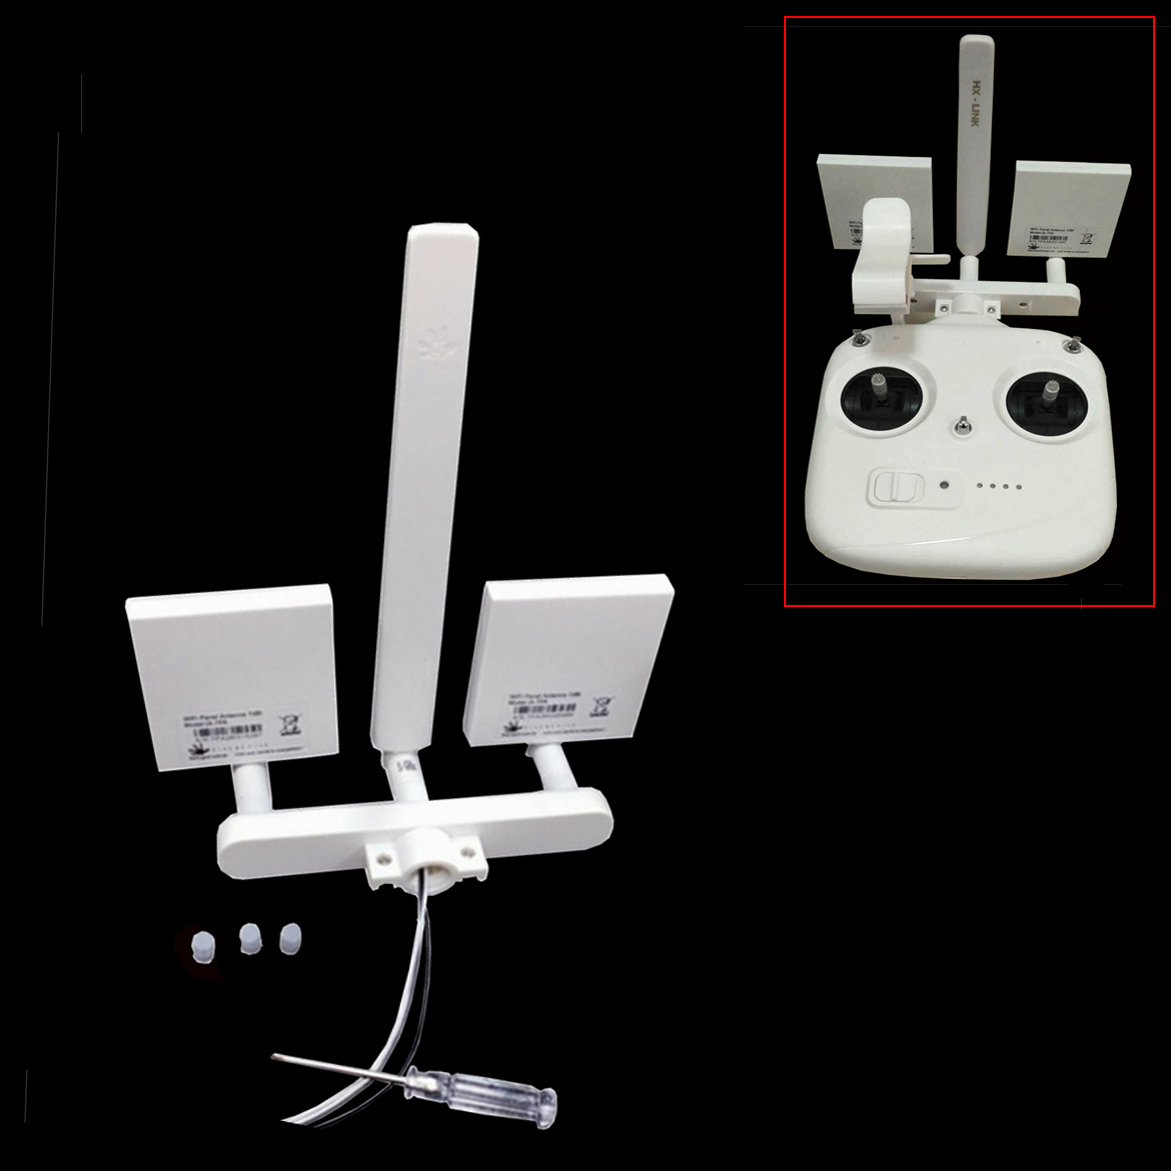 ARGtek DJI Phantom 3 Standard WiFi Signal Range Extender Antenna Kit 7dBi